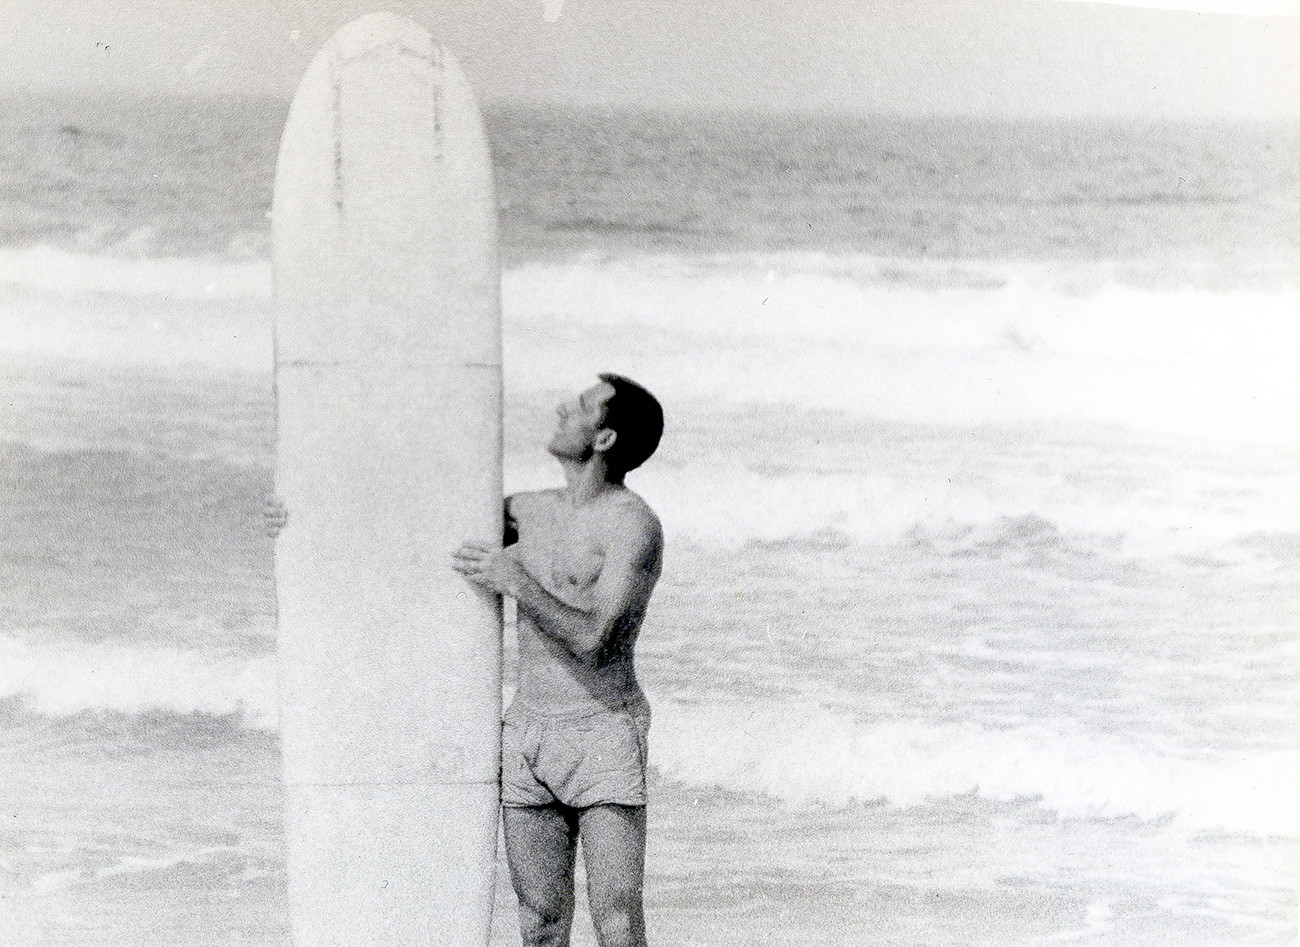 Cape Tarkhankut, Crimea (1966)